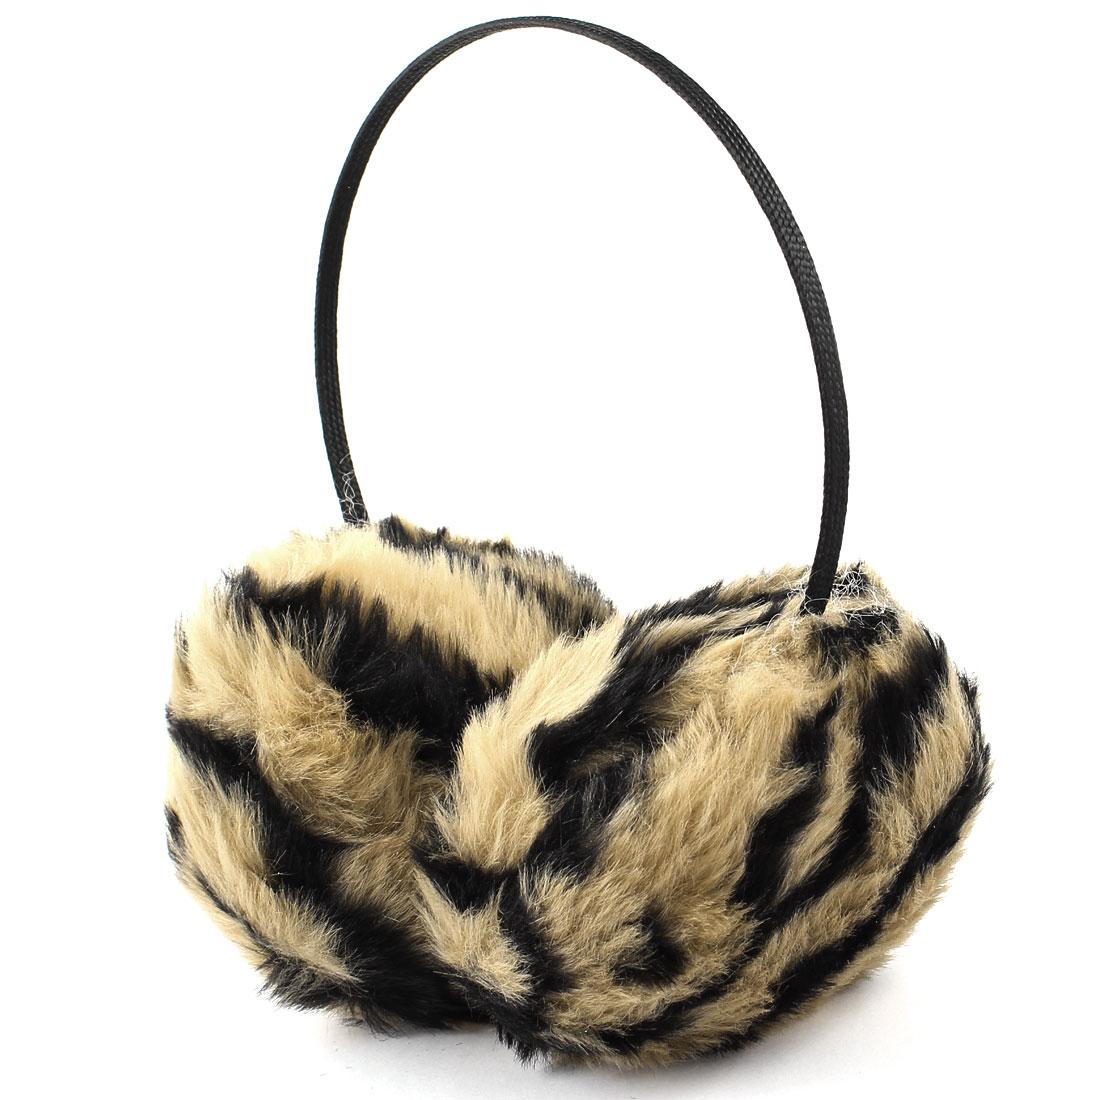 Fluffy Plush Pad Stripe Pattern Black Brown Ear Cover Earmuffs for Unisex